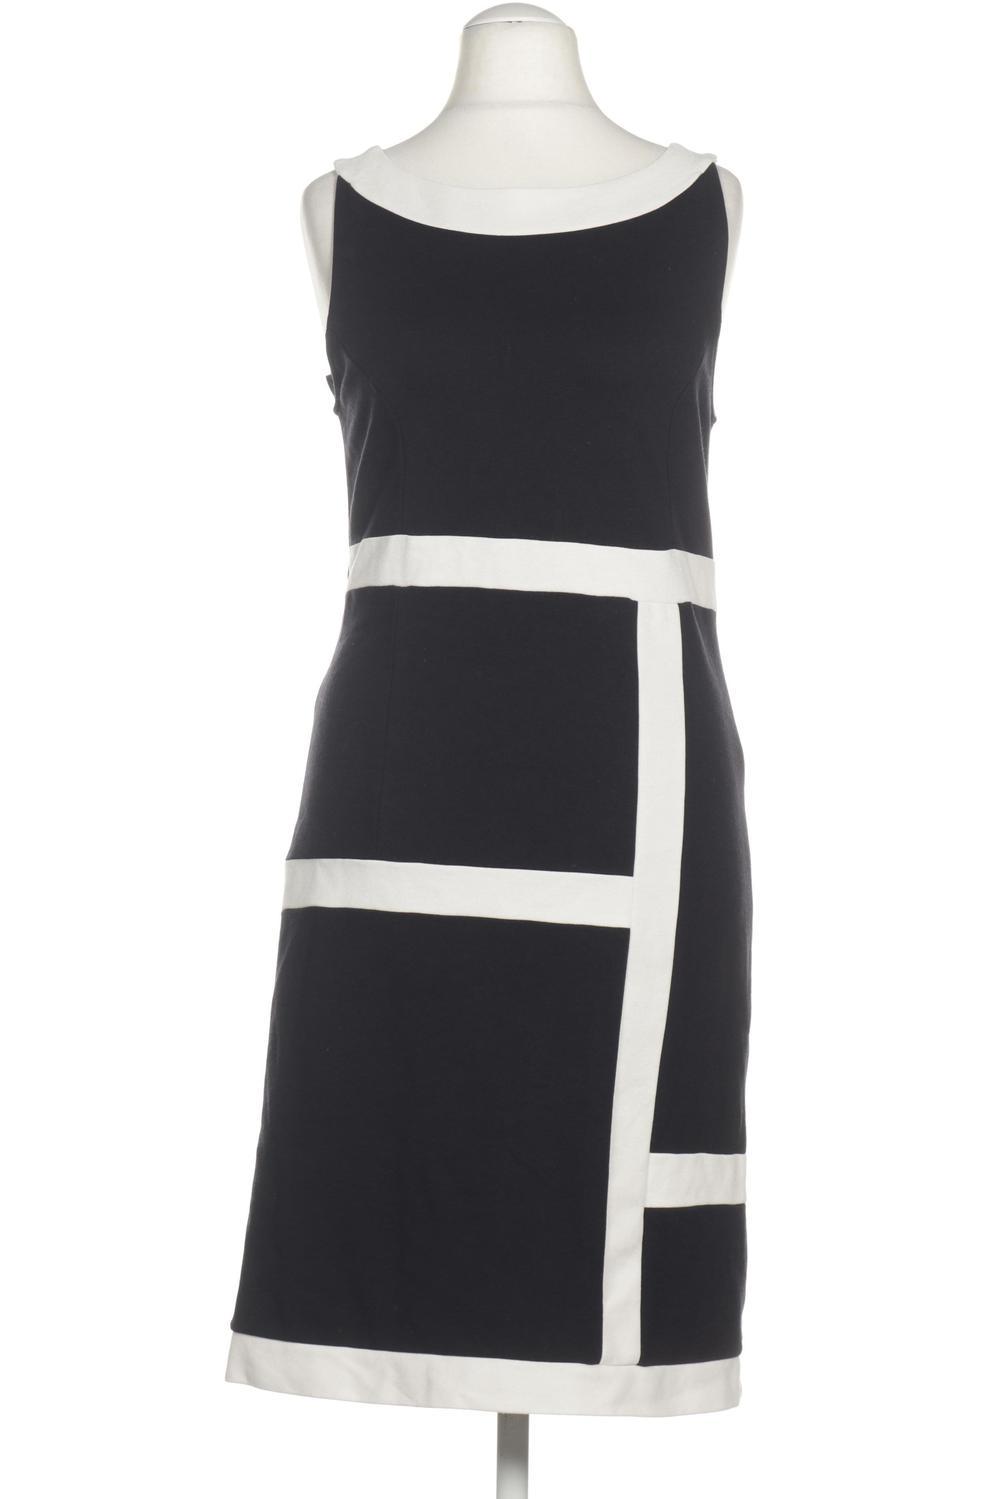 Details zu Comma Kleid Damen Dress Damenkleid Gr. DE 166 Elasthan Viskose  blau #166e166cb16